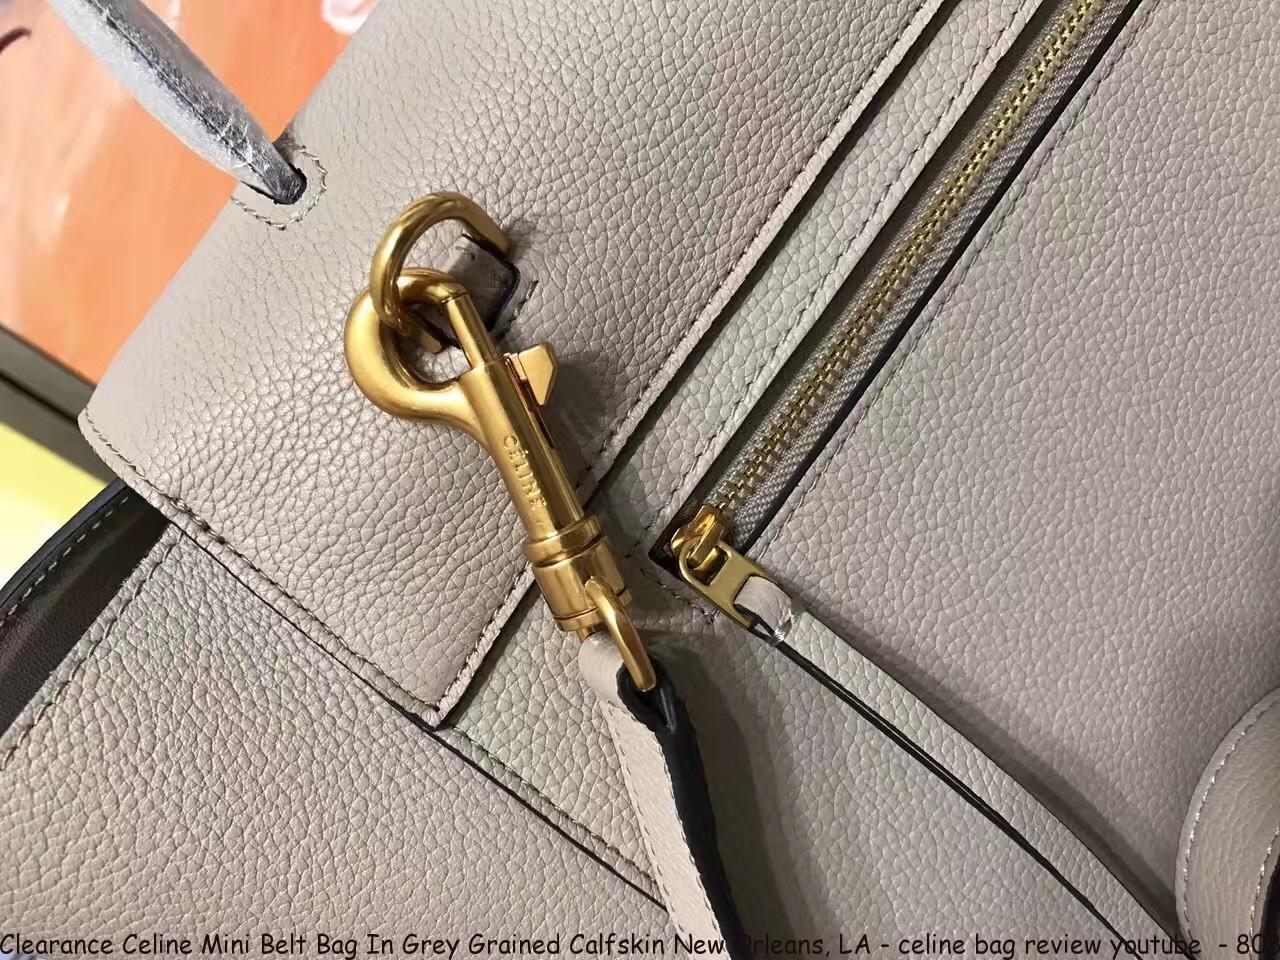 2302802cd8d Clearance Celine Mini Belt Bag In Grey Grained Calfskin New Orleans ...